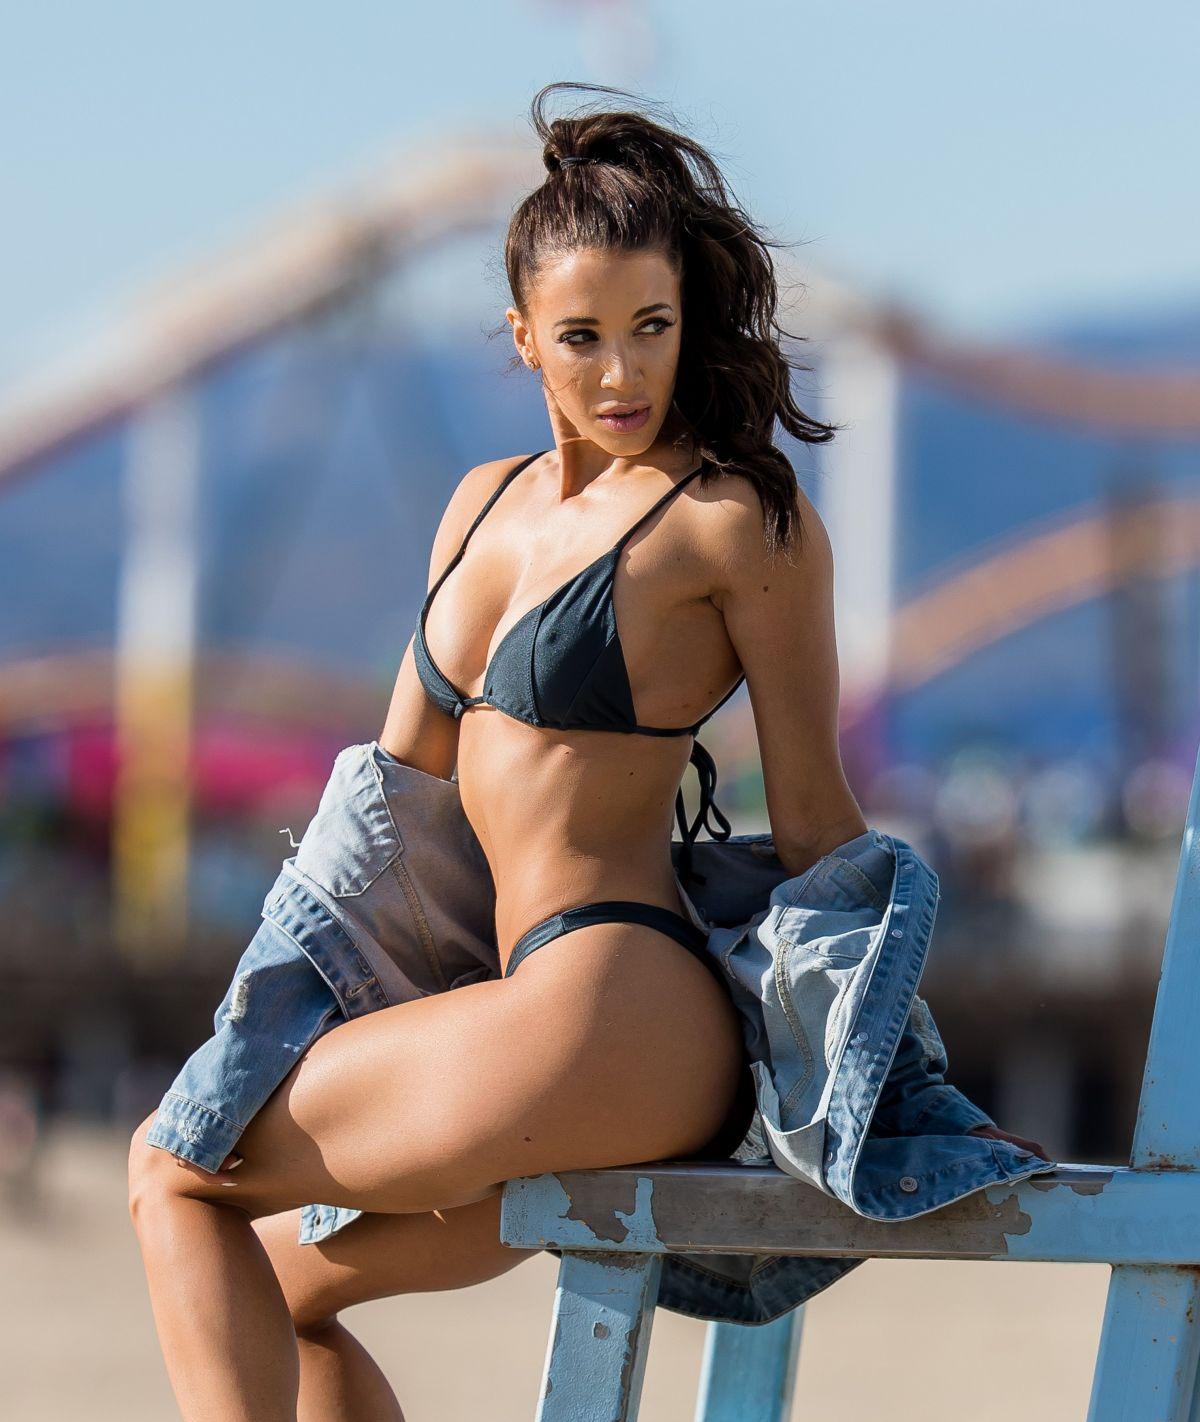 Casey Martin in Black Bikini on the beach in Santa Monica Pic 2 of 35